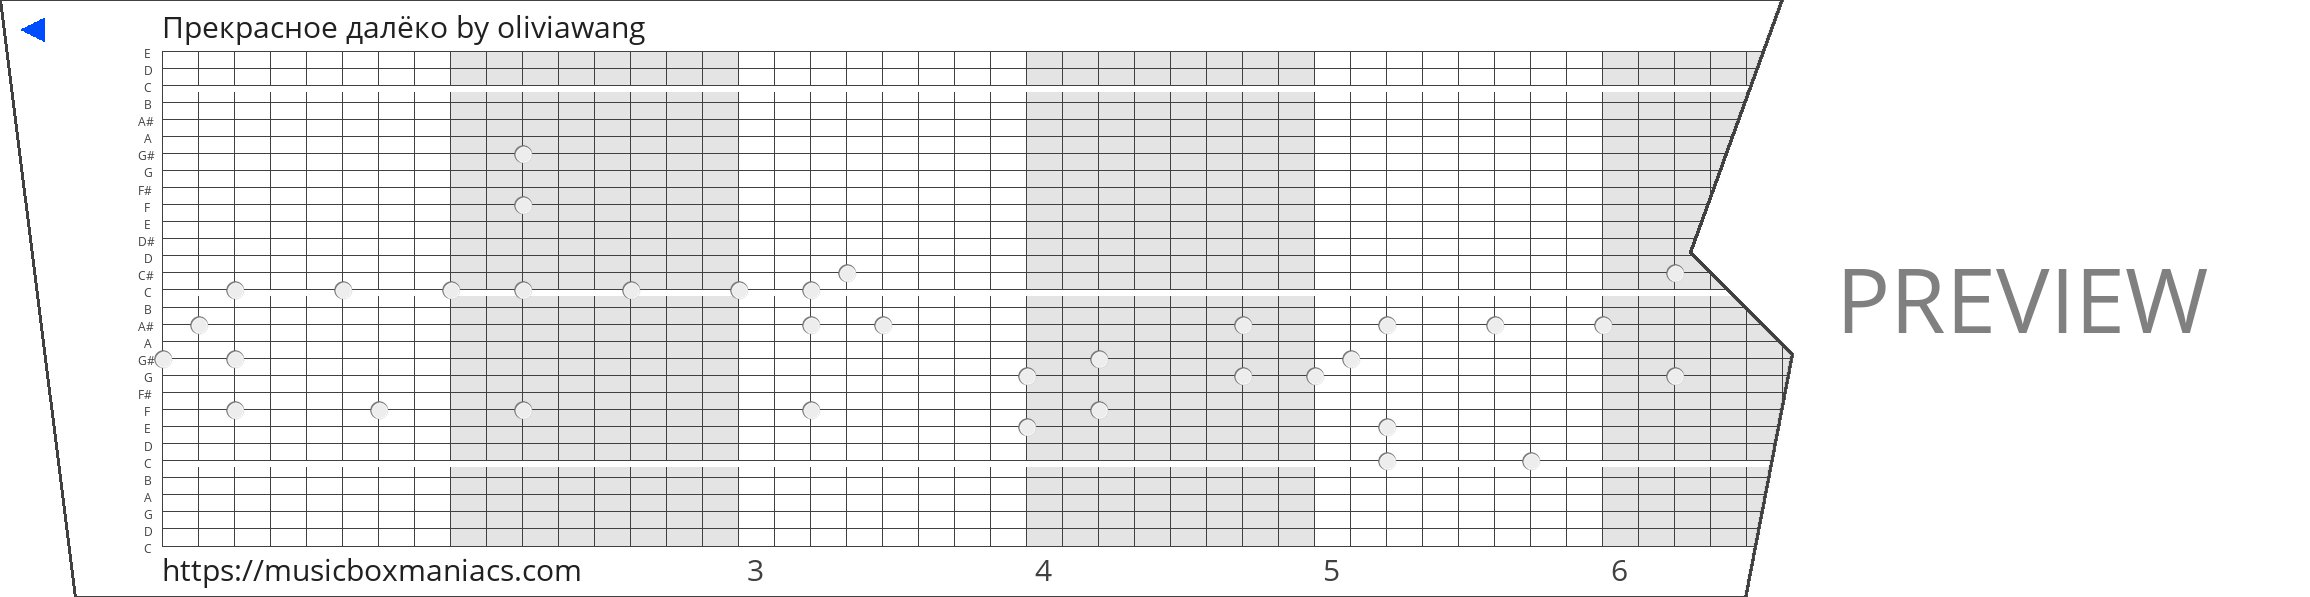 Прекрасное далёко 30 note music box paper strip